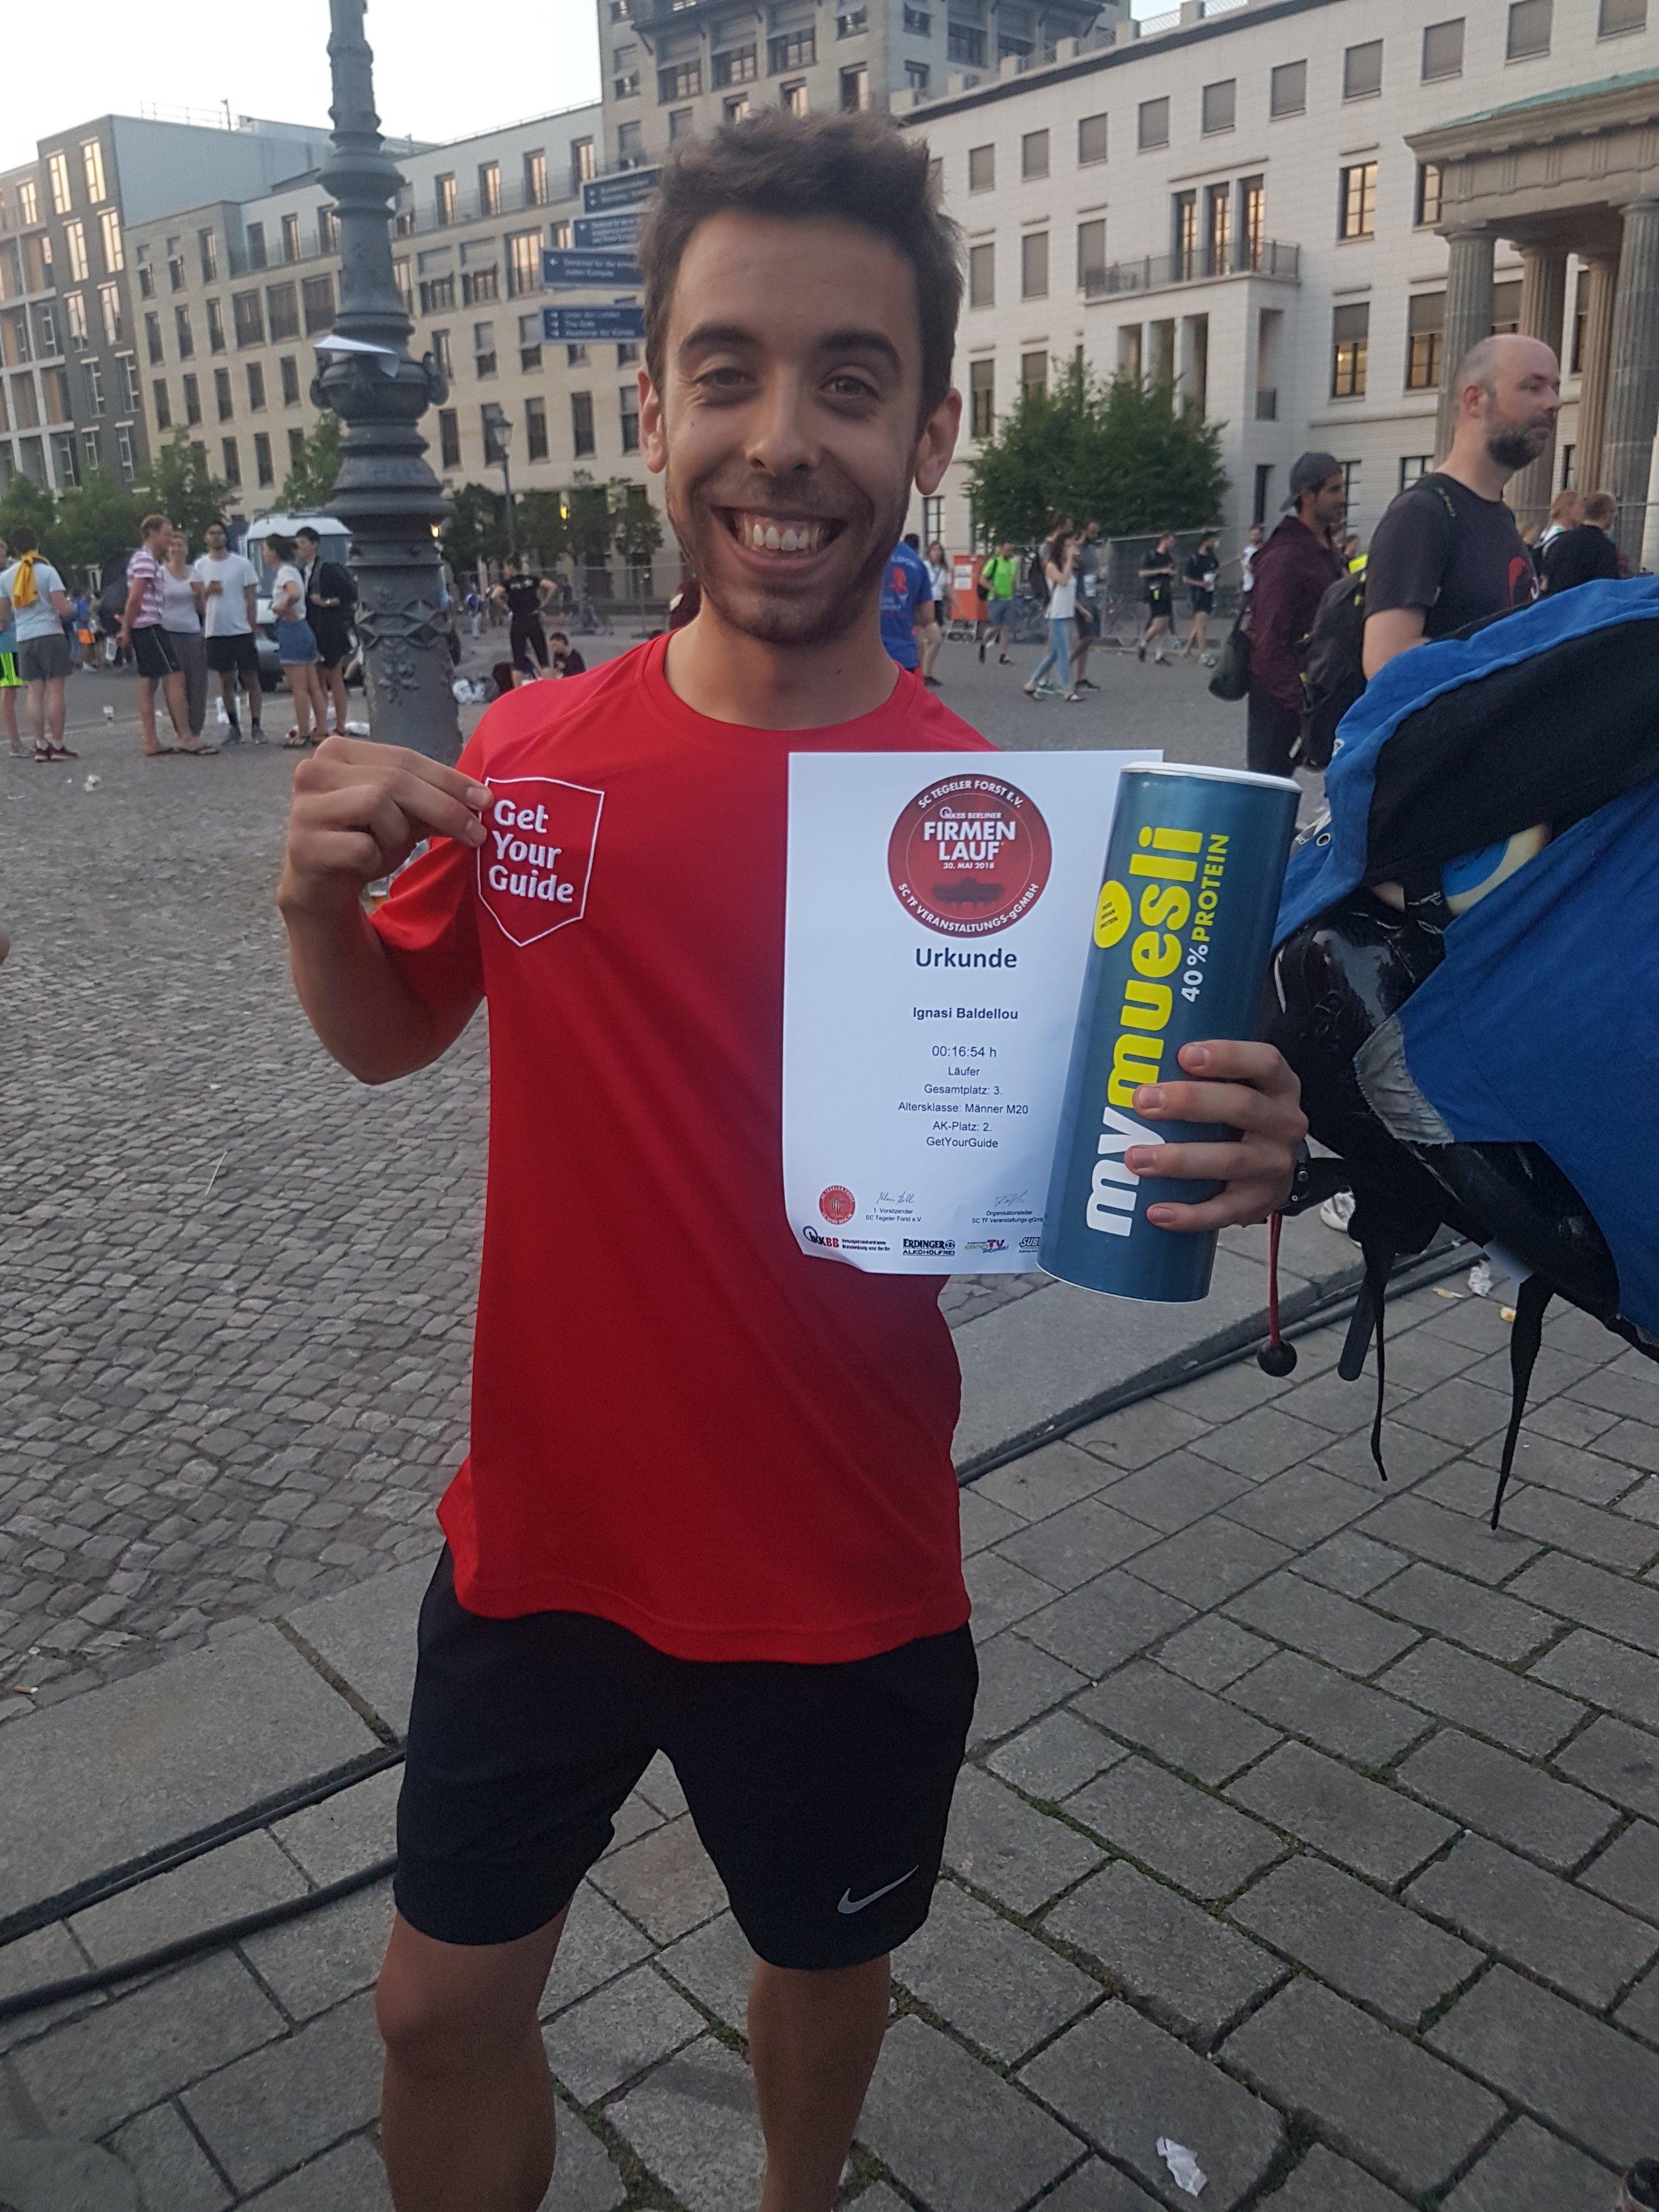 Ignasi, following his 3rd-place finish in the 2018 IKK BB Berliner Firmenlauf